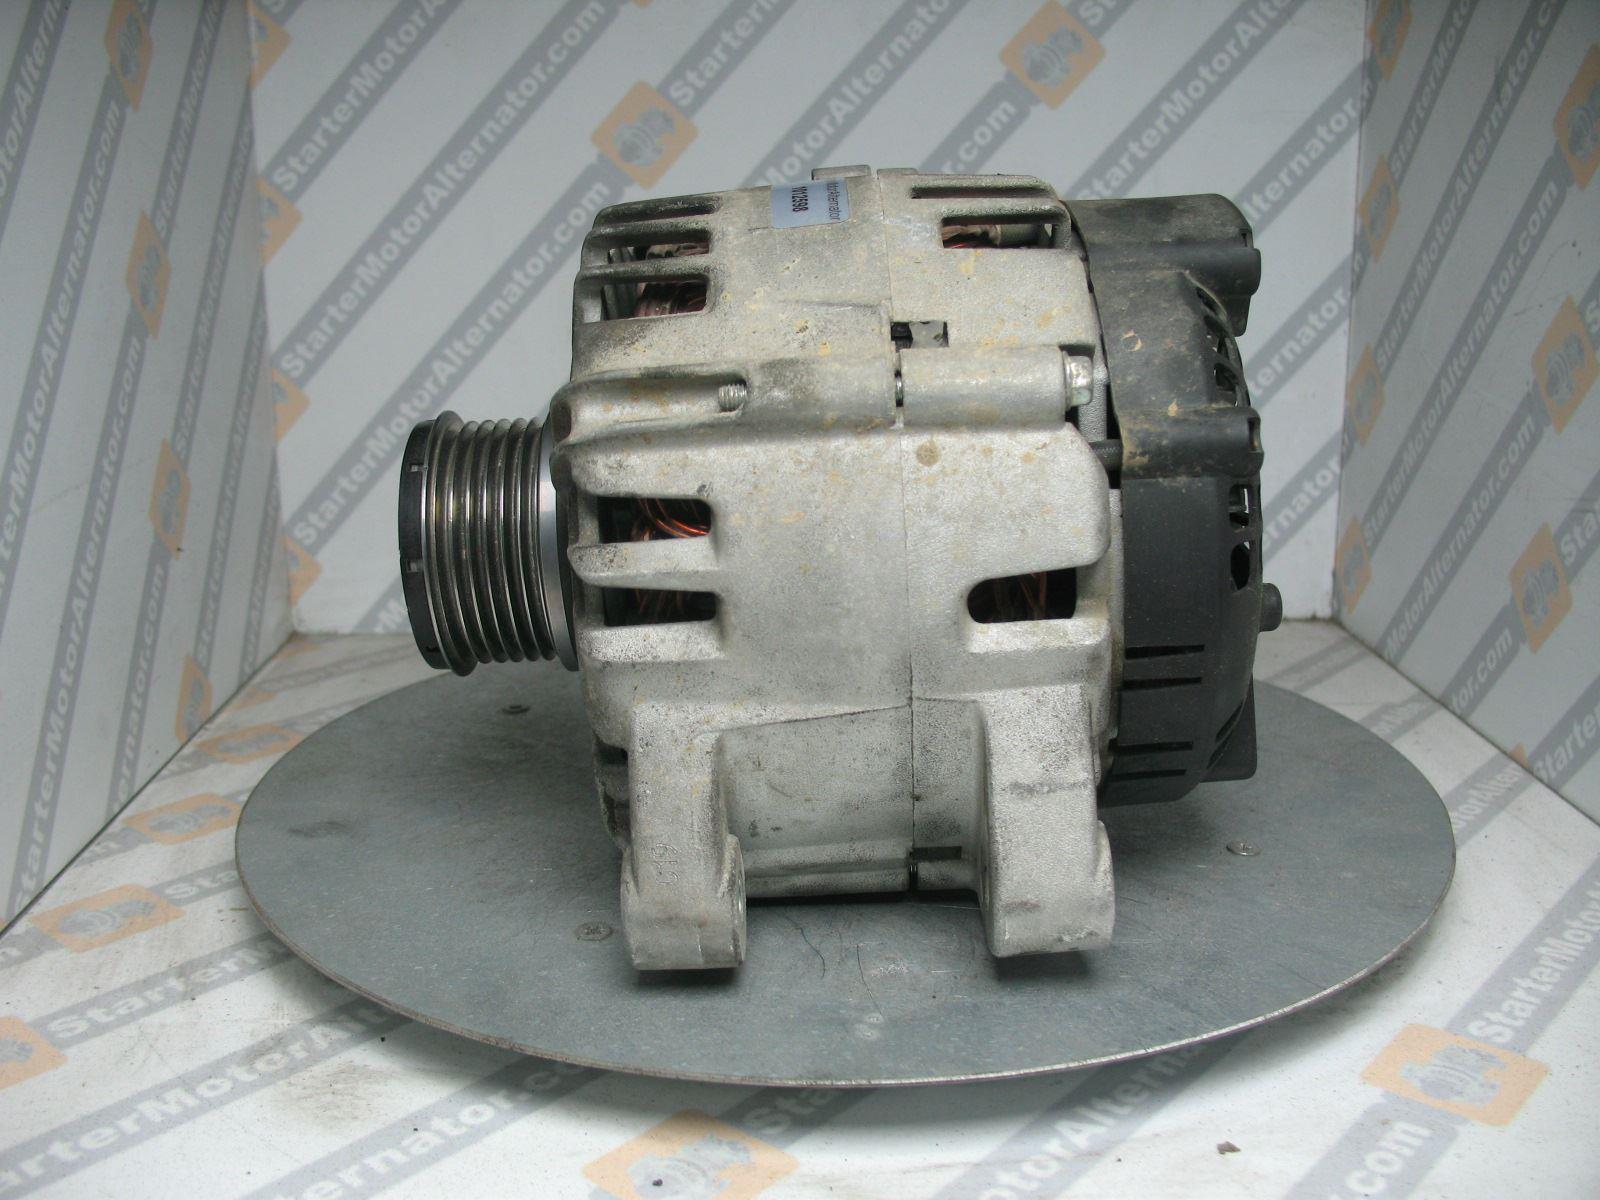 XIC2033 Alternator For Citroen / DS / Fiat / Mitsubishi / Peugeot / Toyota / Vauxhall